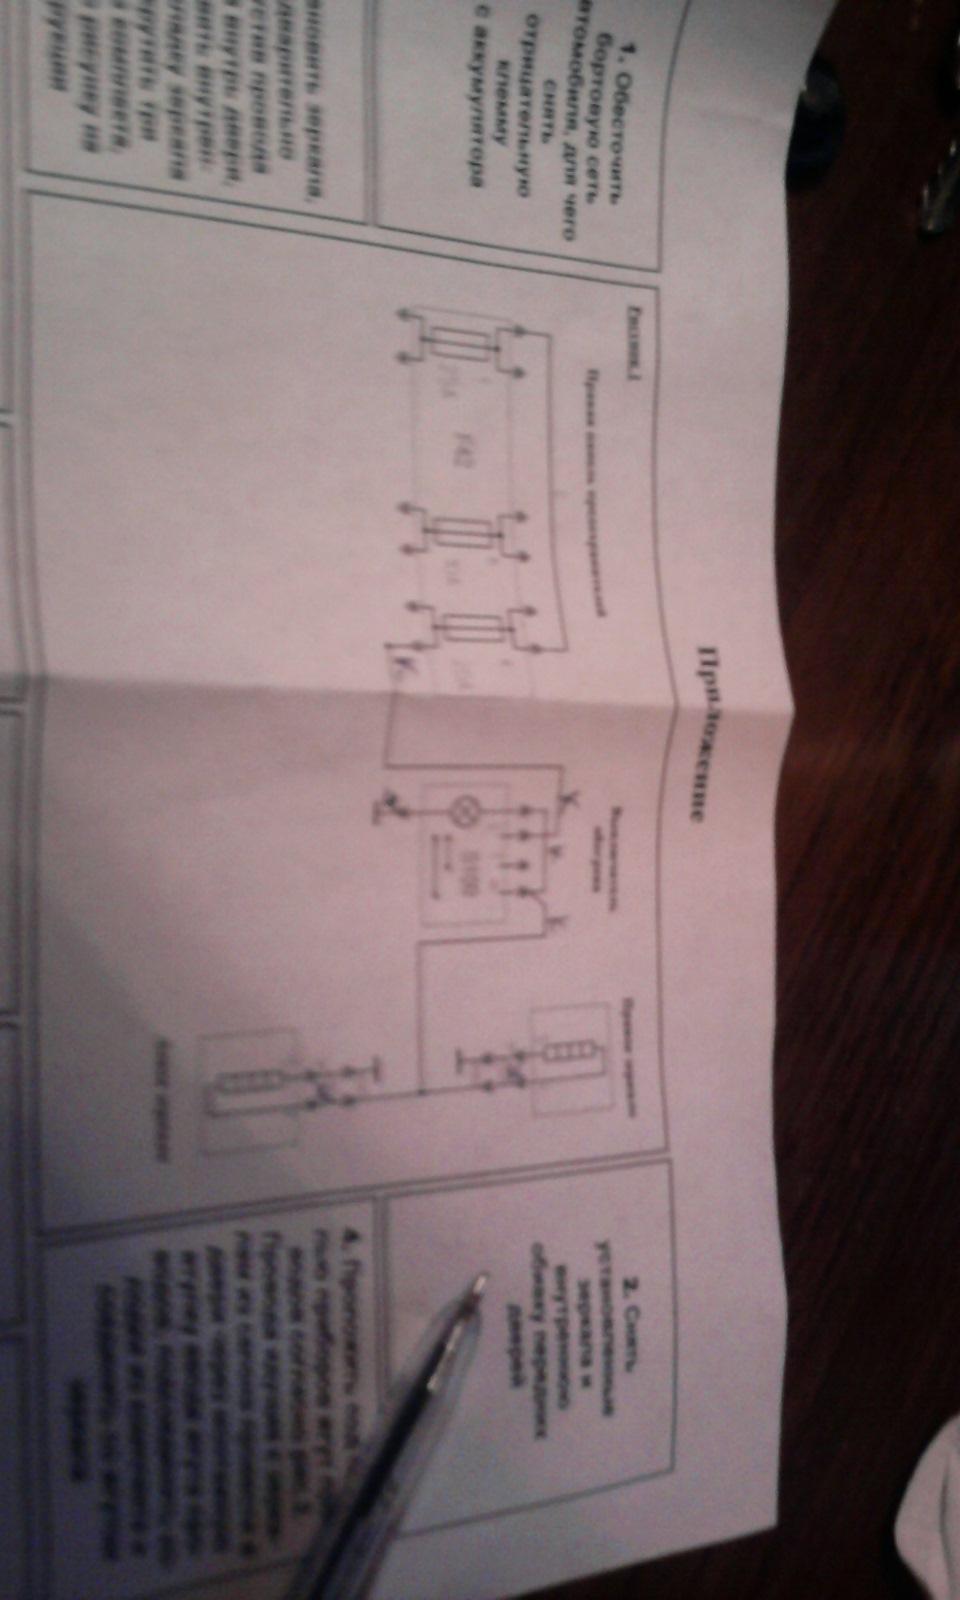 схема подключения автозеркал на ваз 21124 с подогревом